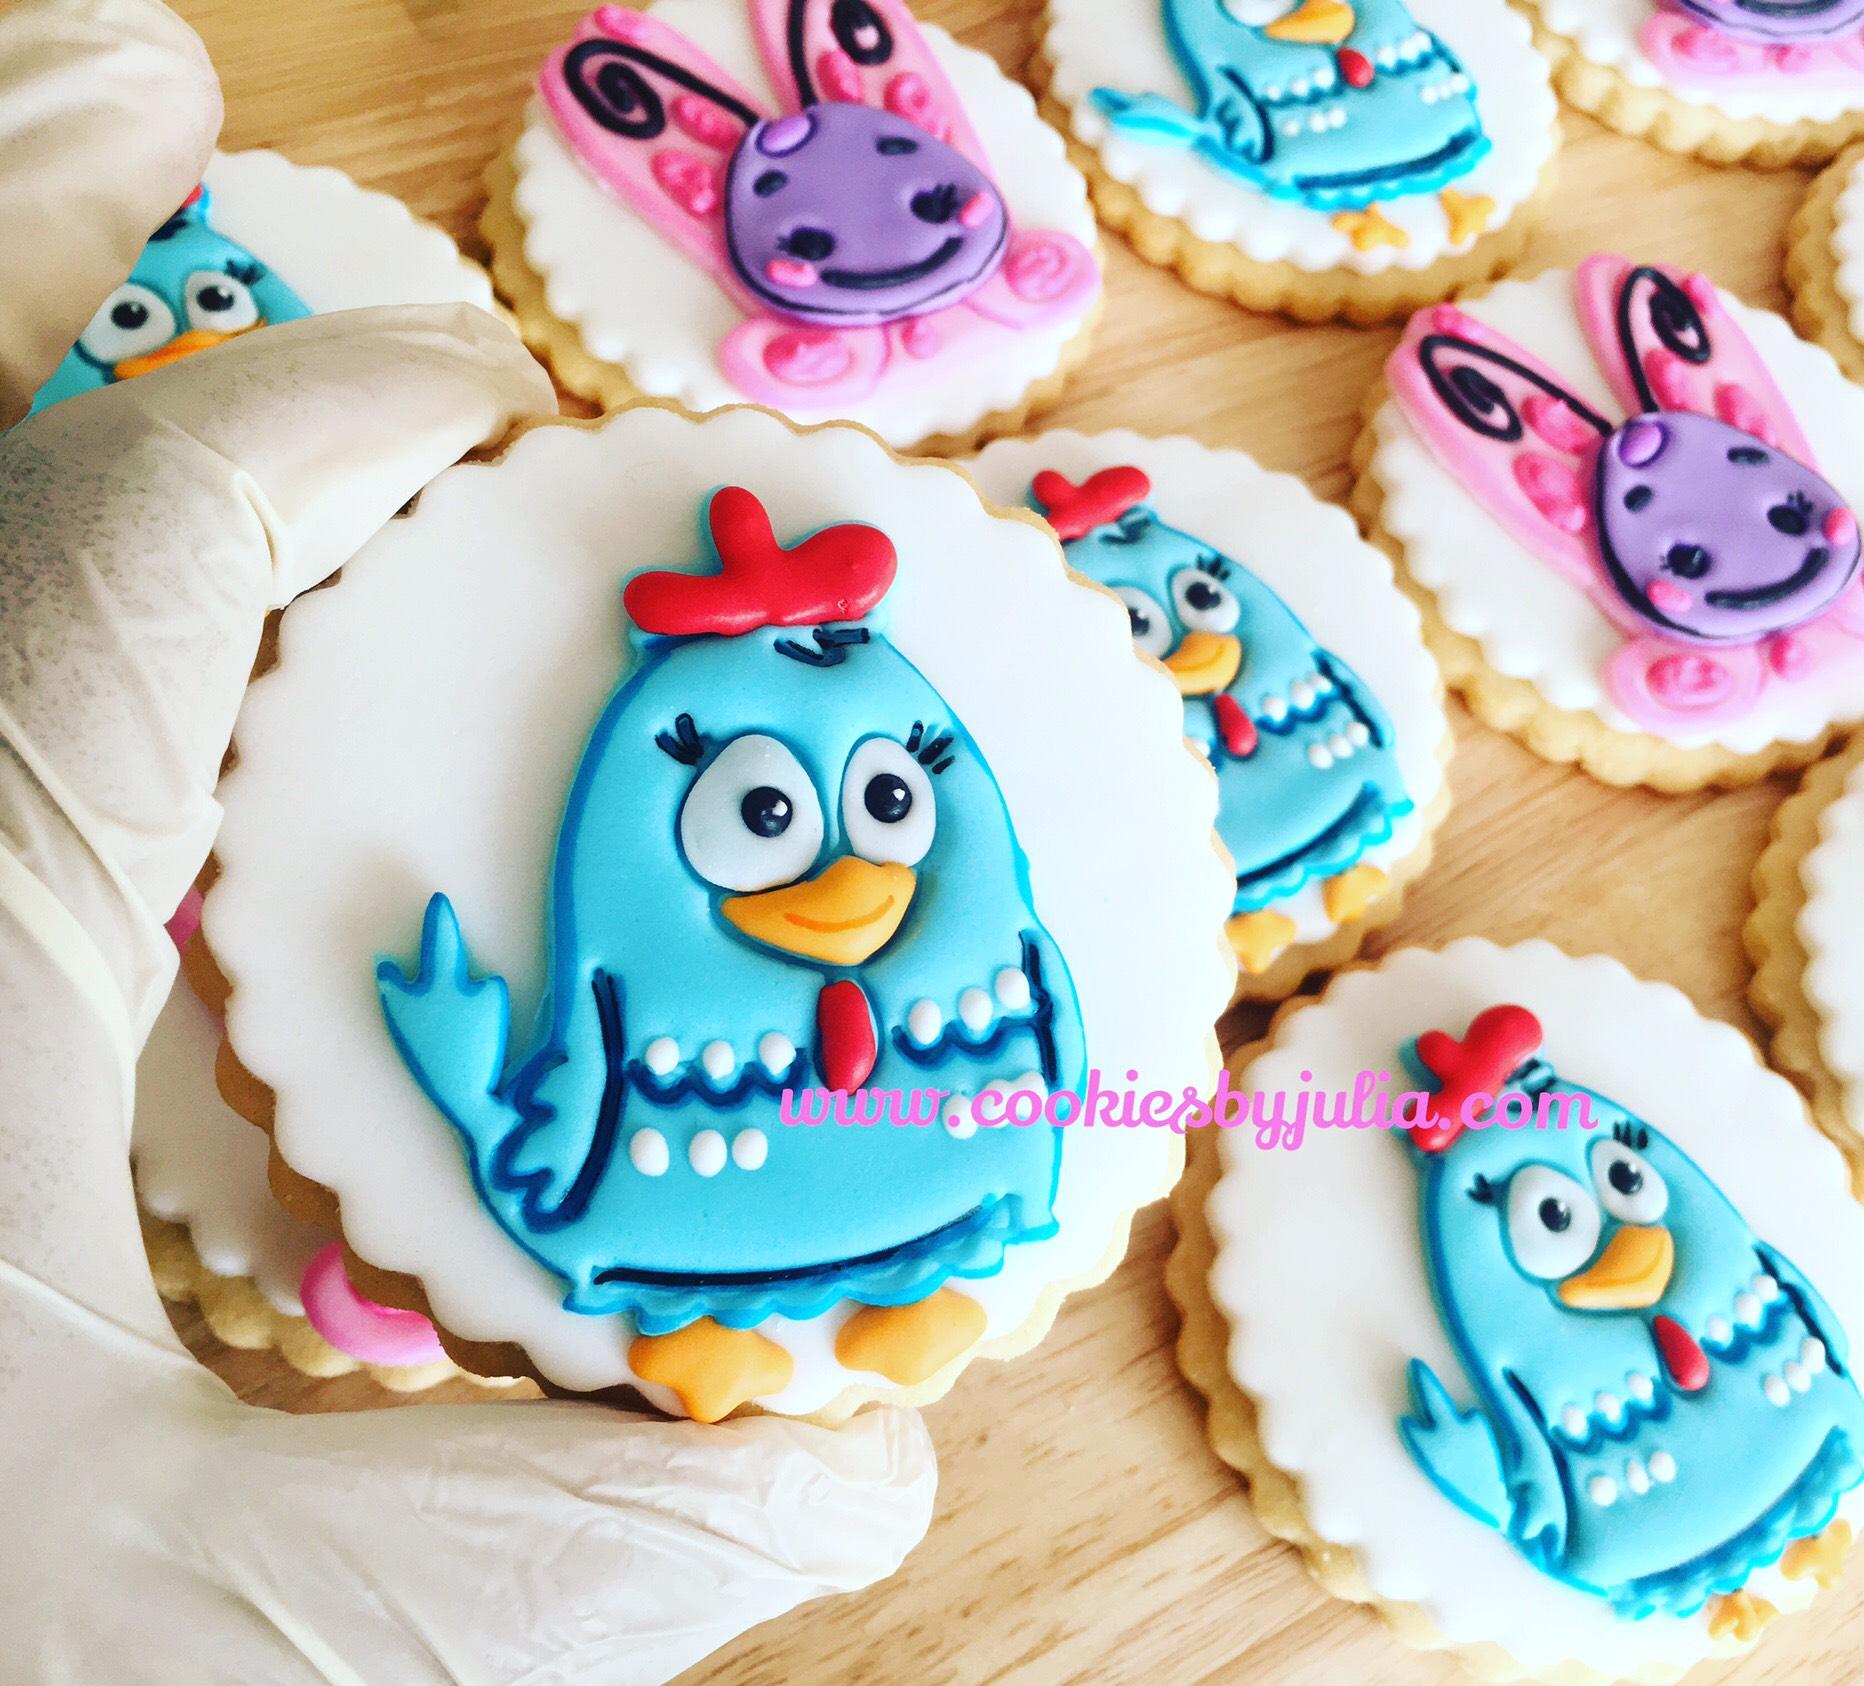 Blue bird fondant cookies